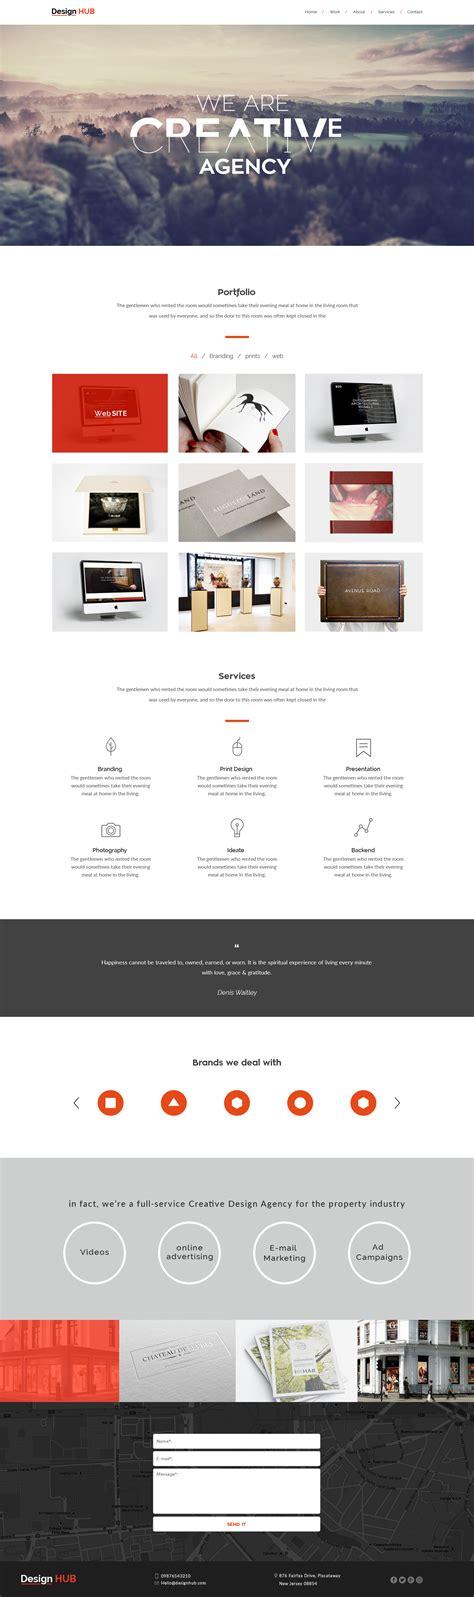 design hub menu design hub by coolingwindow themeforest